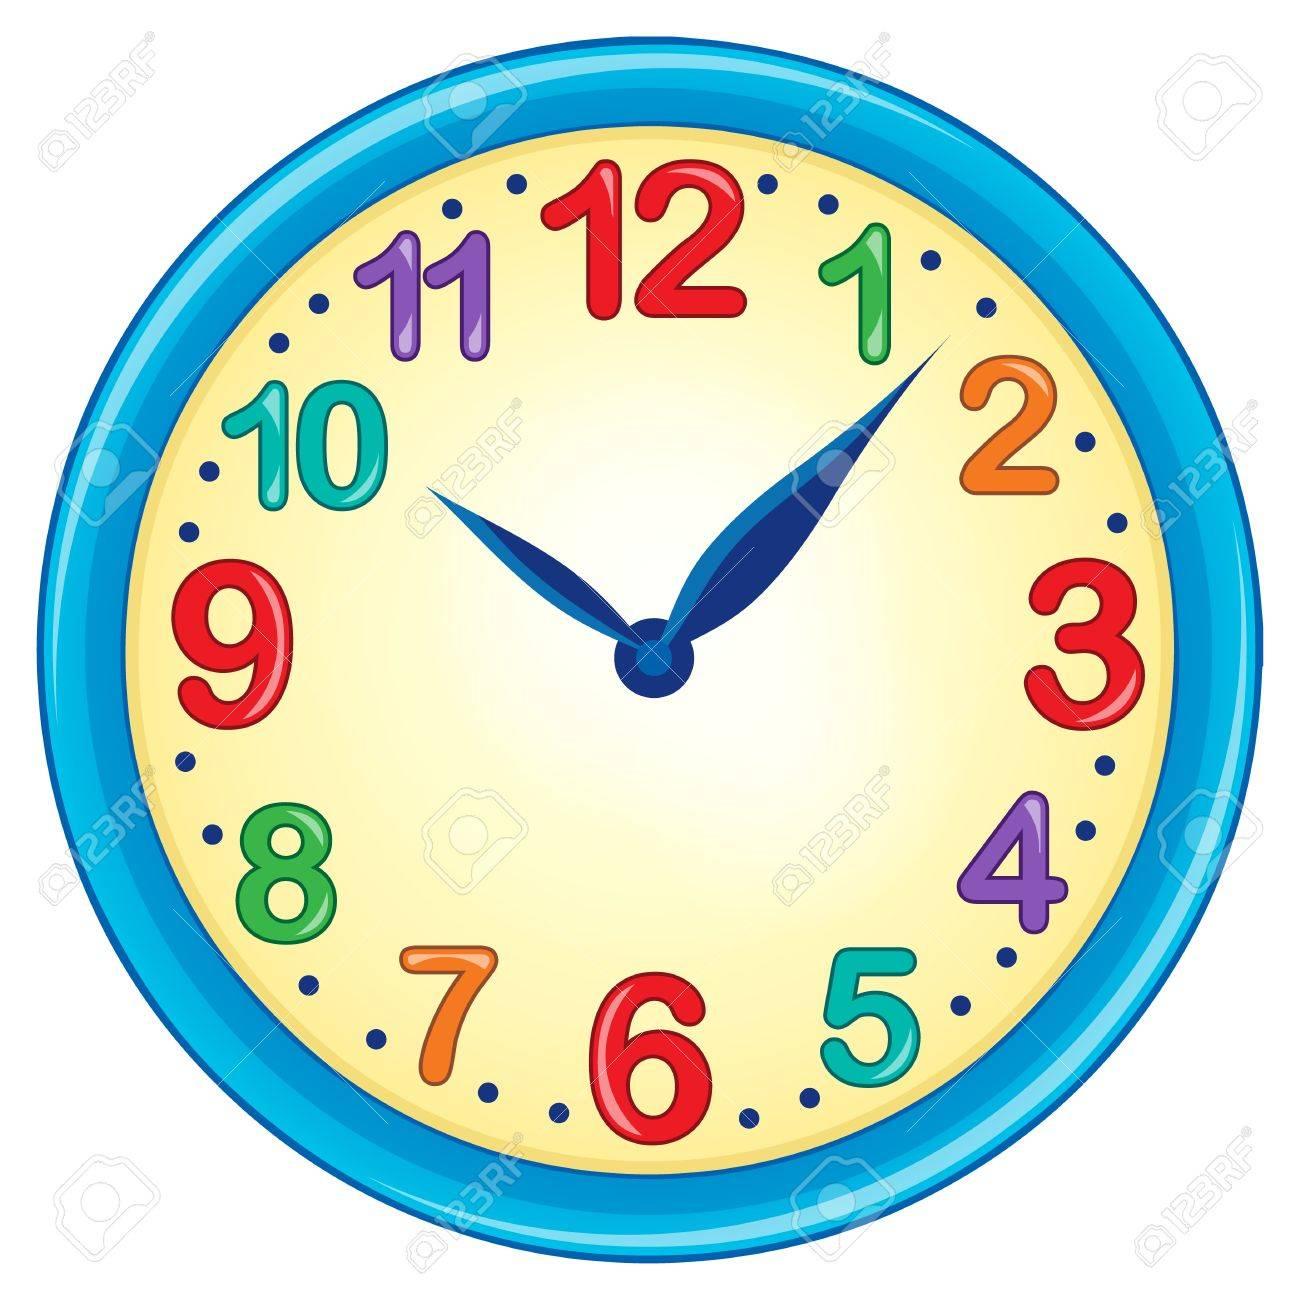 Clock theme image 3 - eps10 vector illustration. Stock Vector - 37770981